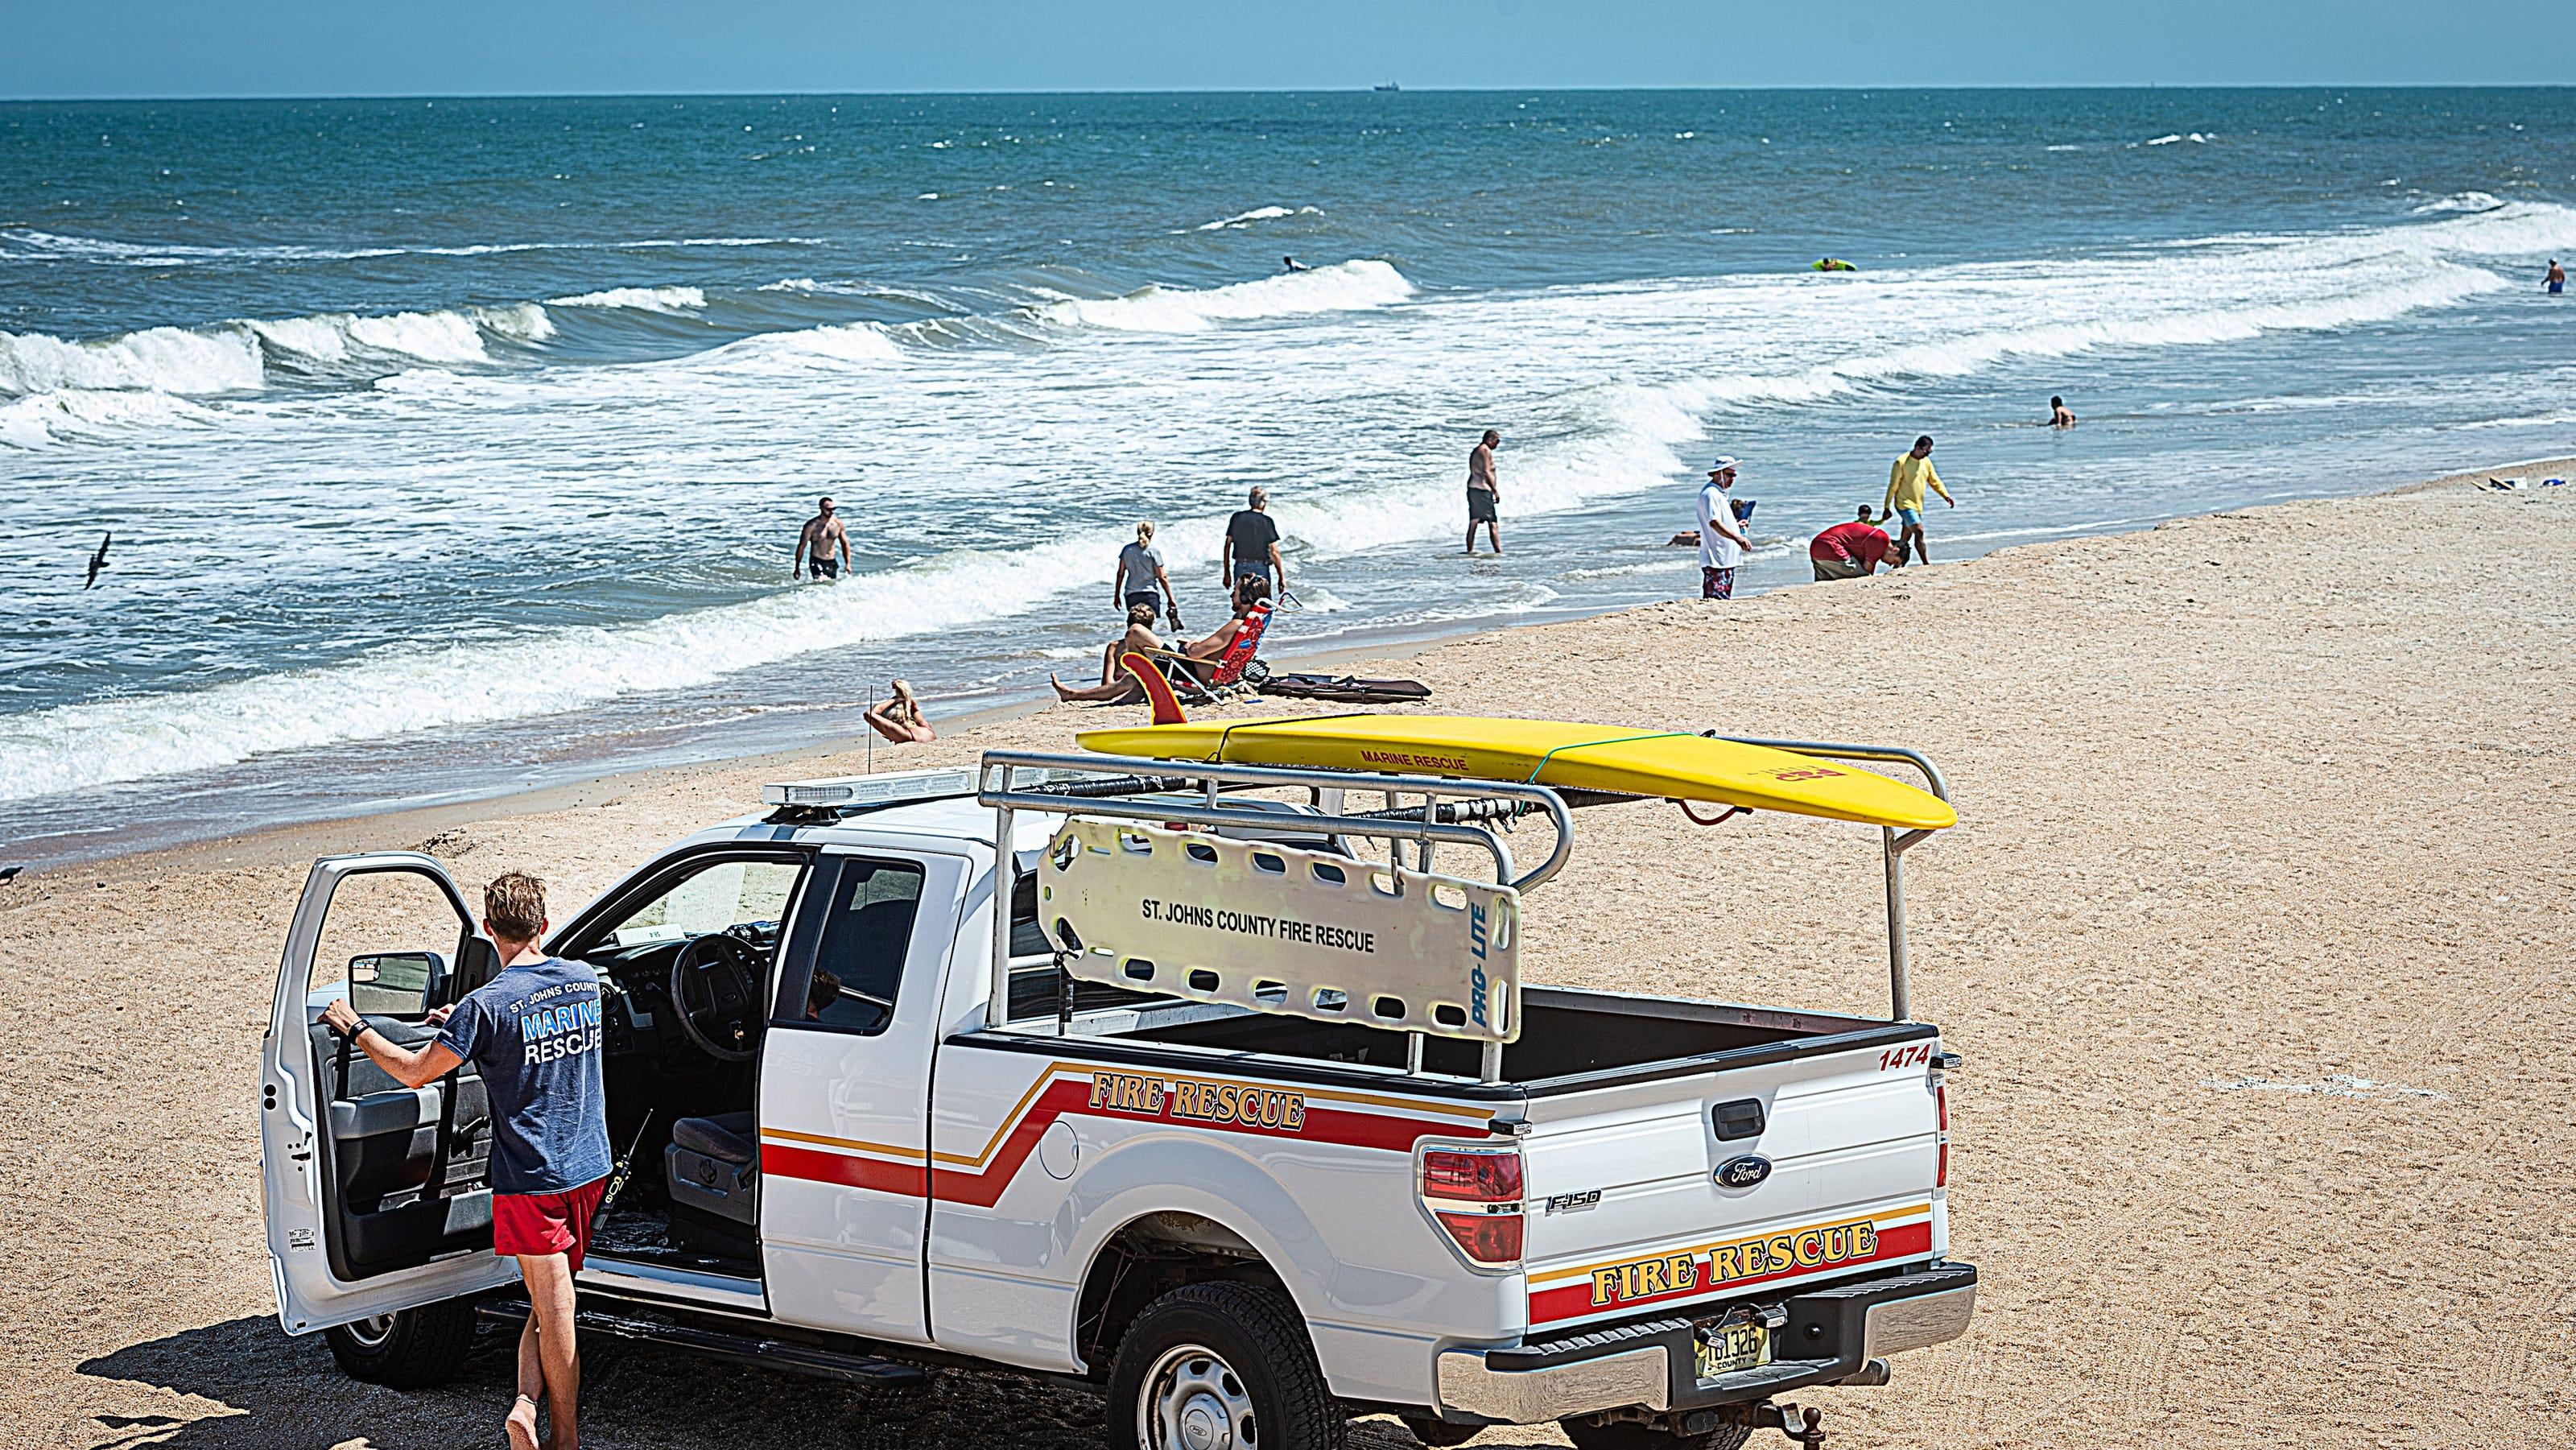 527e3a12 f07b 403f 9ed6 9050a852aadb FL SAR 08272019 beach jpg?crop=4199,2362,x0,y180&width=3200&height=1801&format=pjpg&auto=webp.